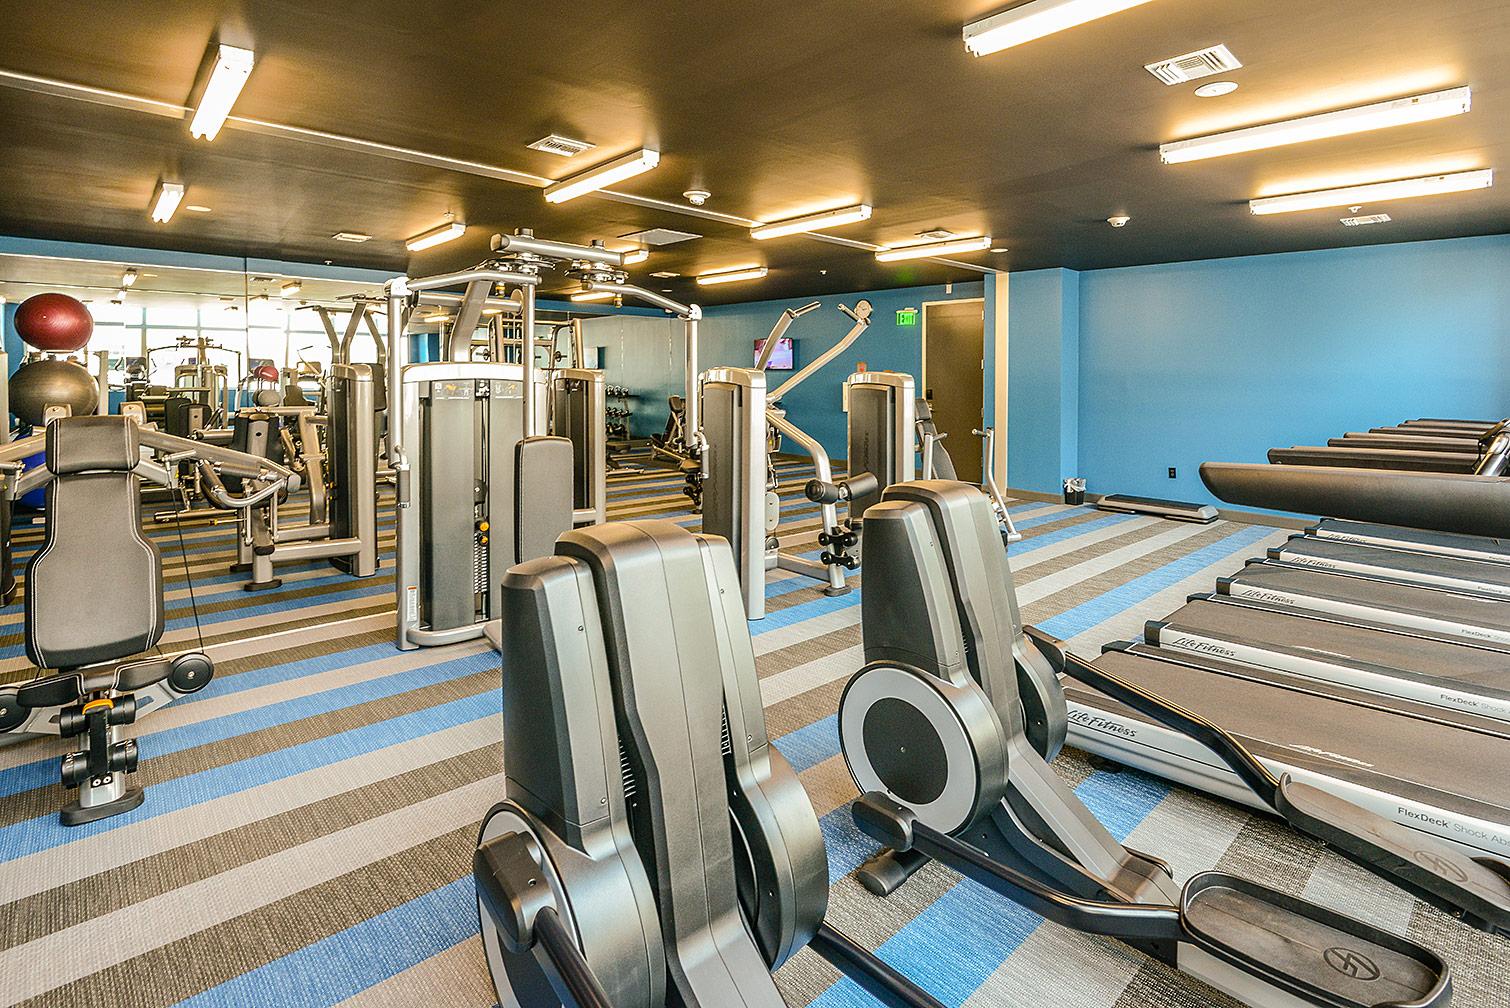 Aloft Hotel Workout Facility